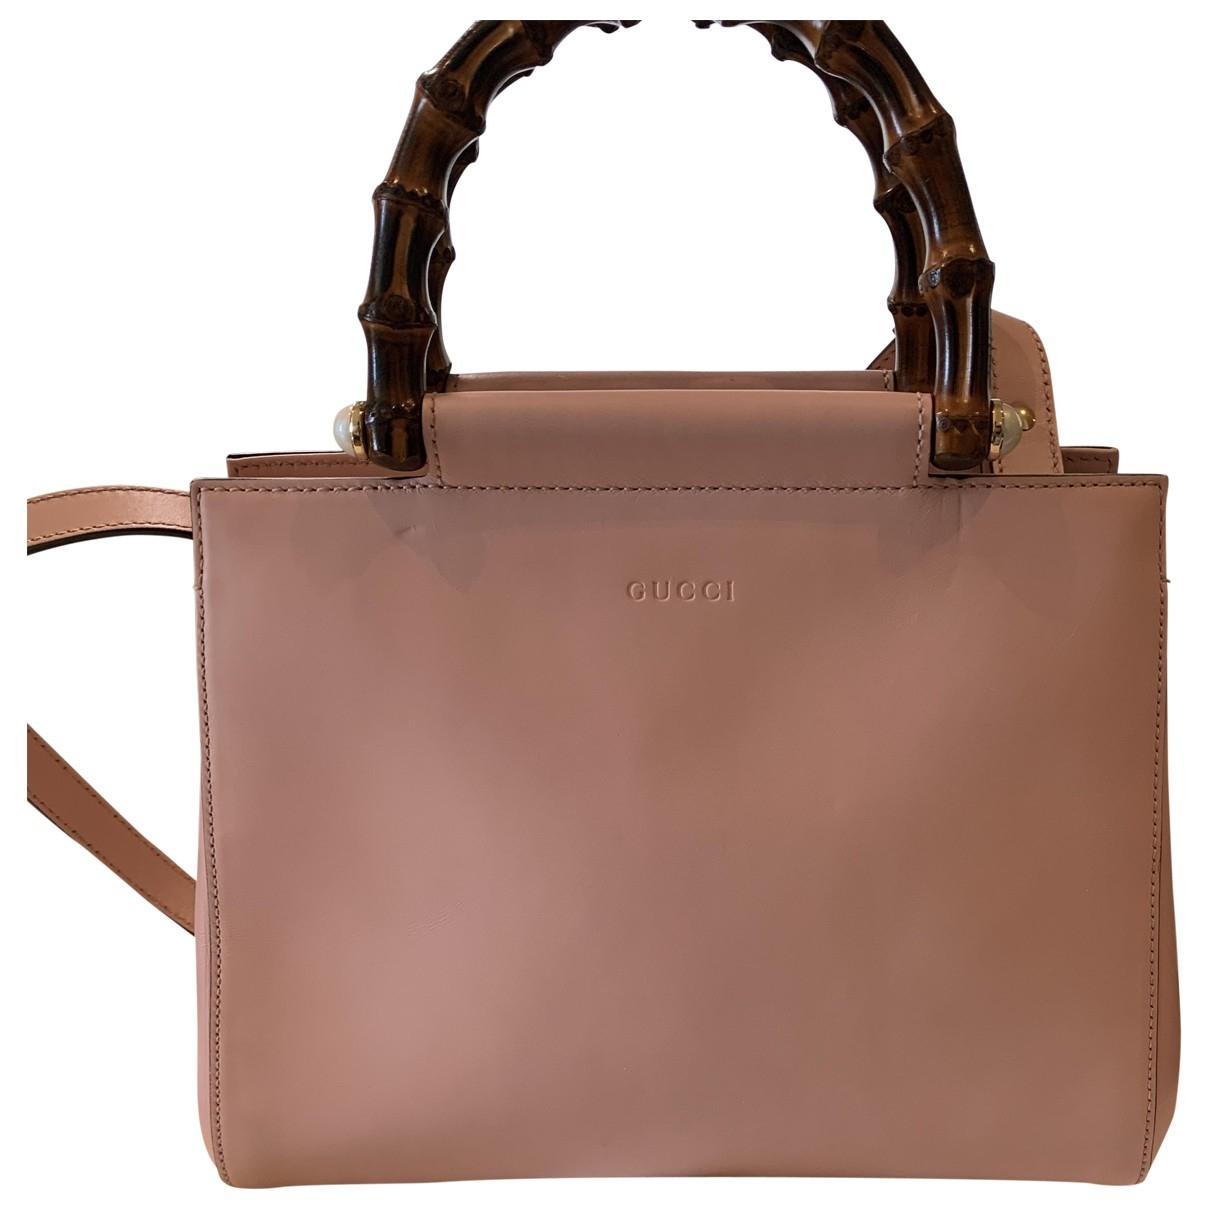 Gucci - Sac a main Nymphaea pour femme en cuir - rose